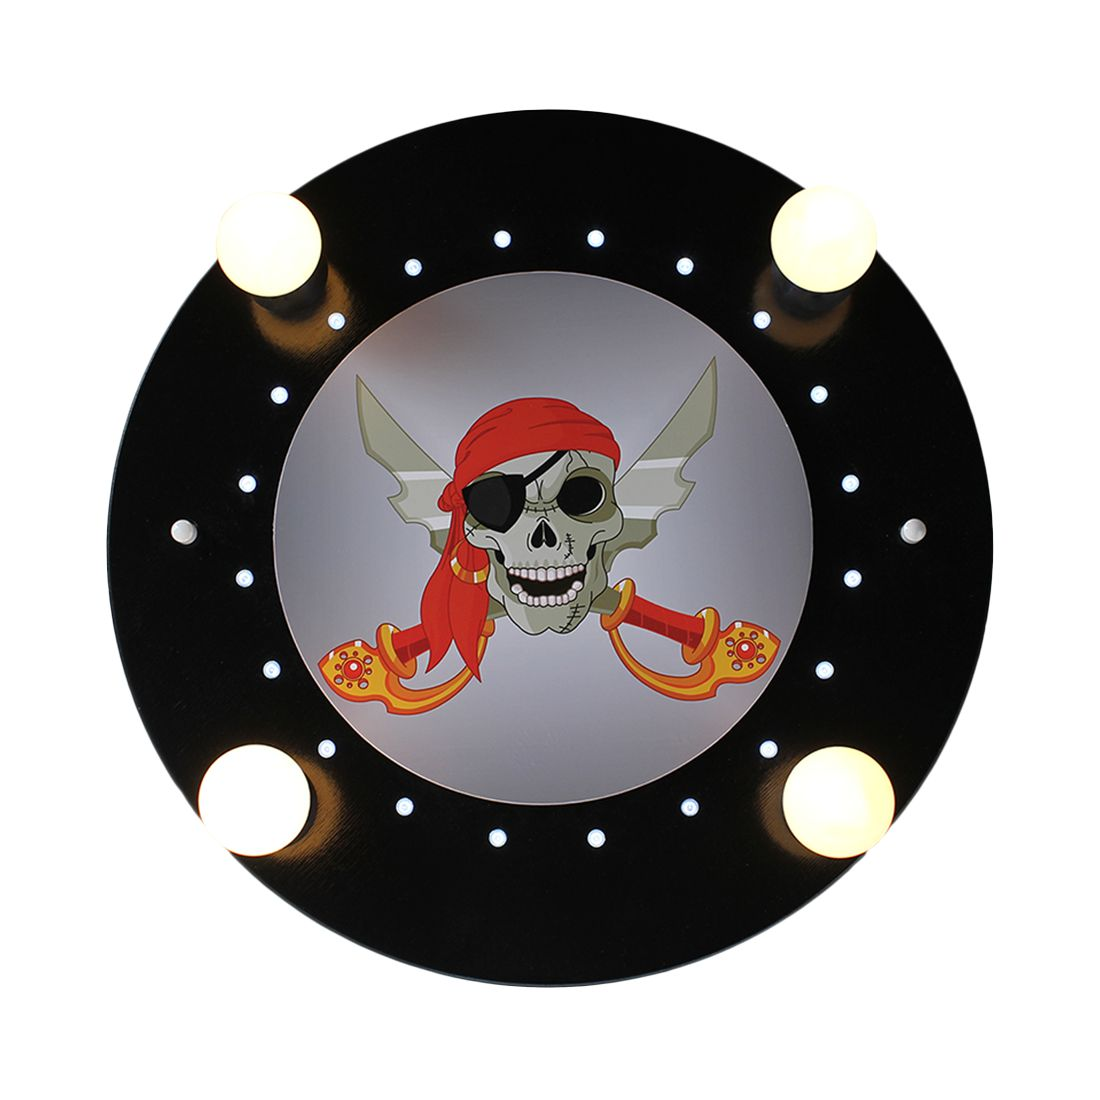 Deckenleuchte Piratenkopf 4/20 ● Holz ● 4-flammig- Elobra A+